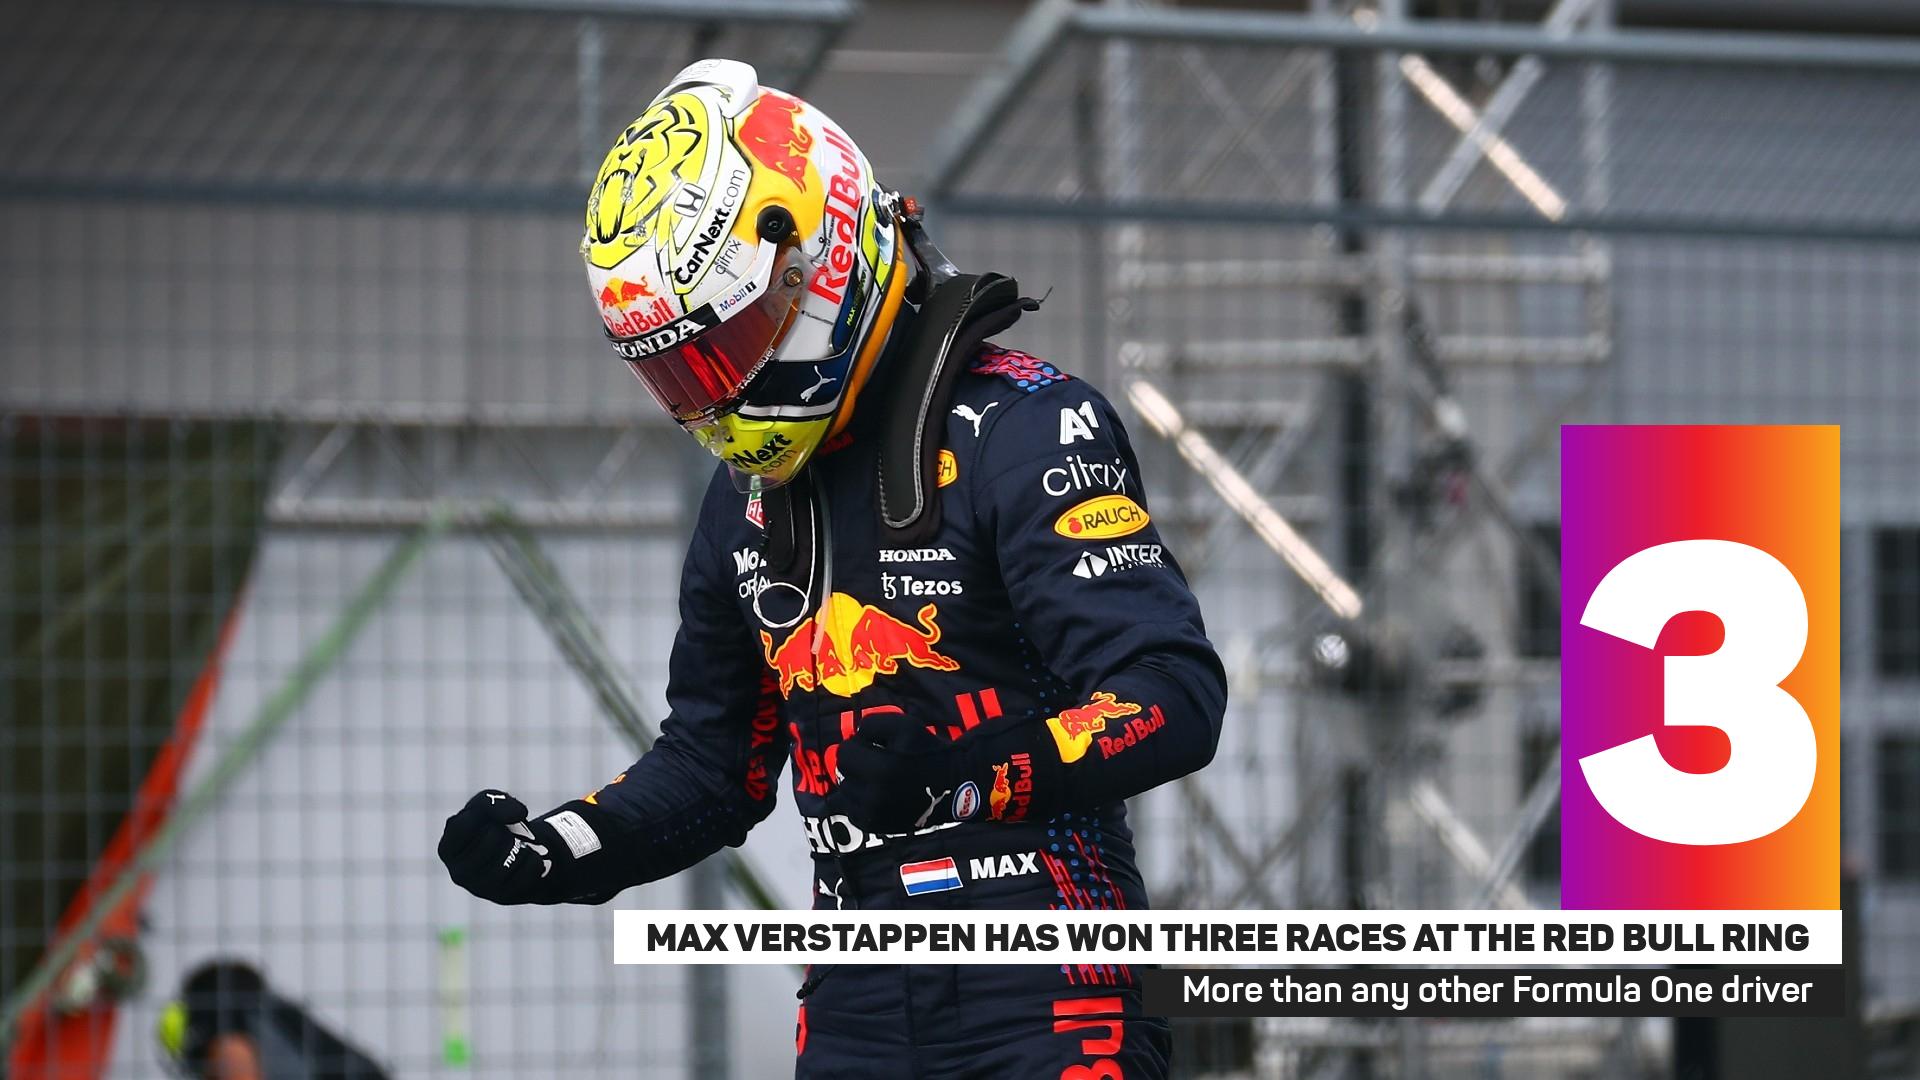 Max Verstappen celebrates his win in Spielberg last week